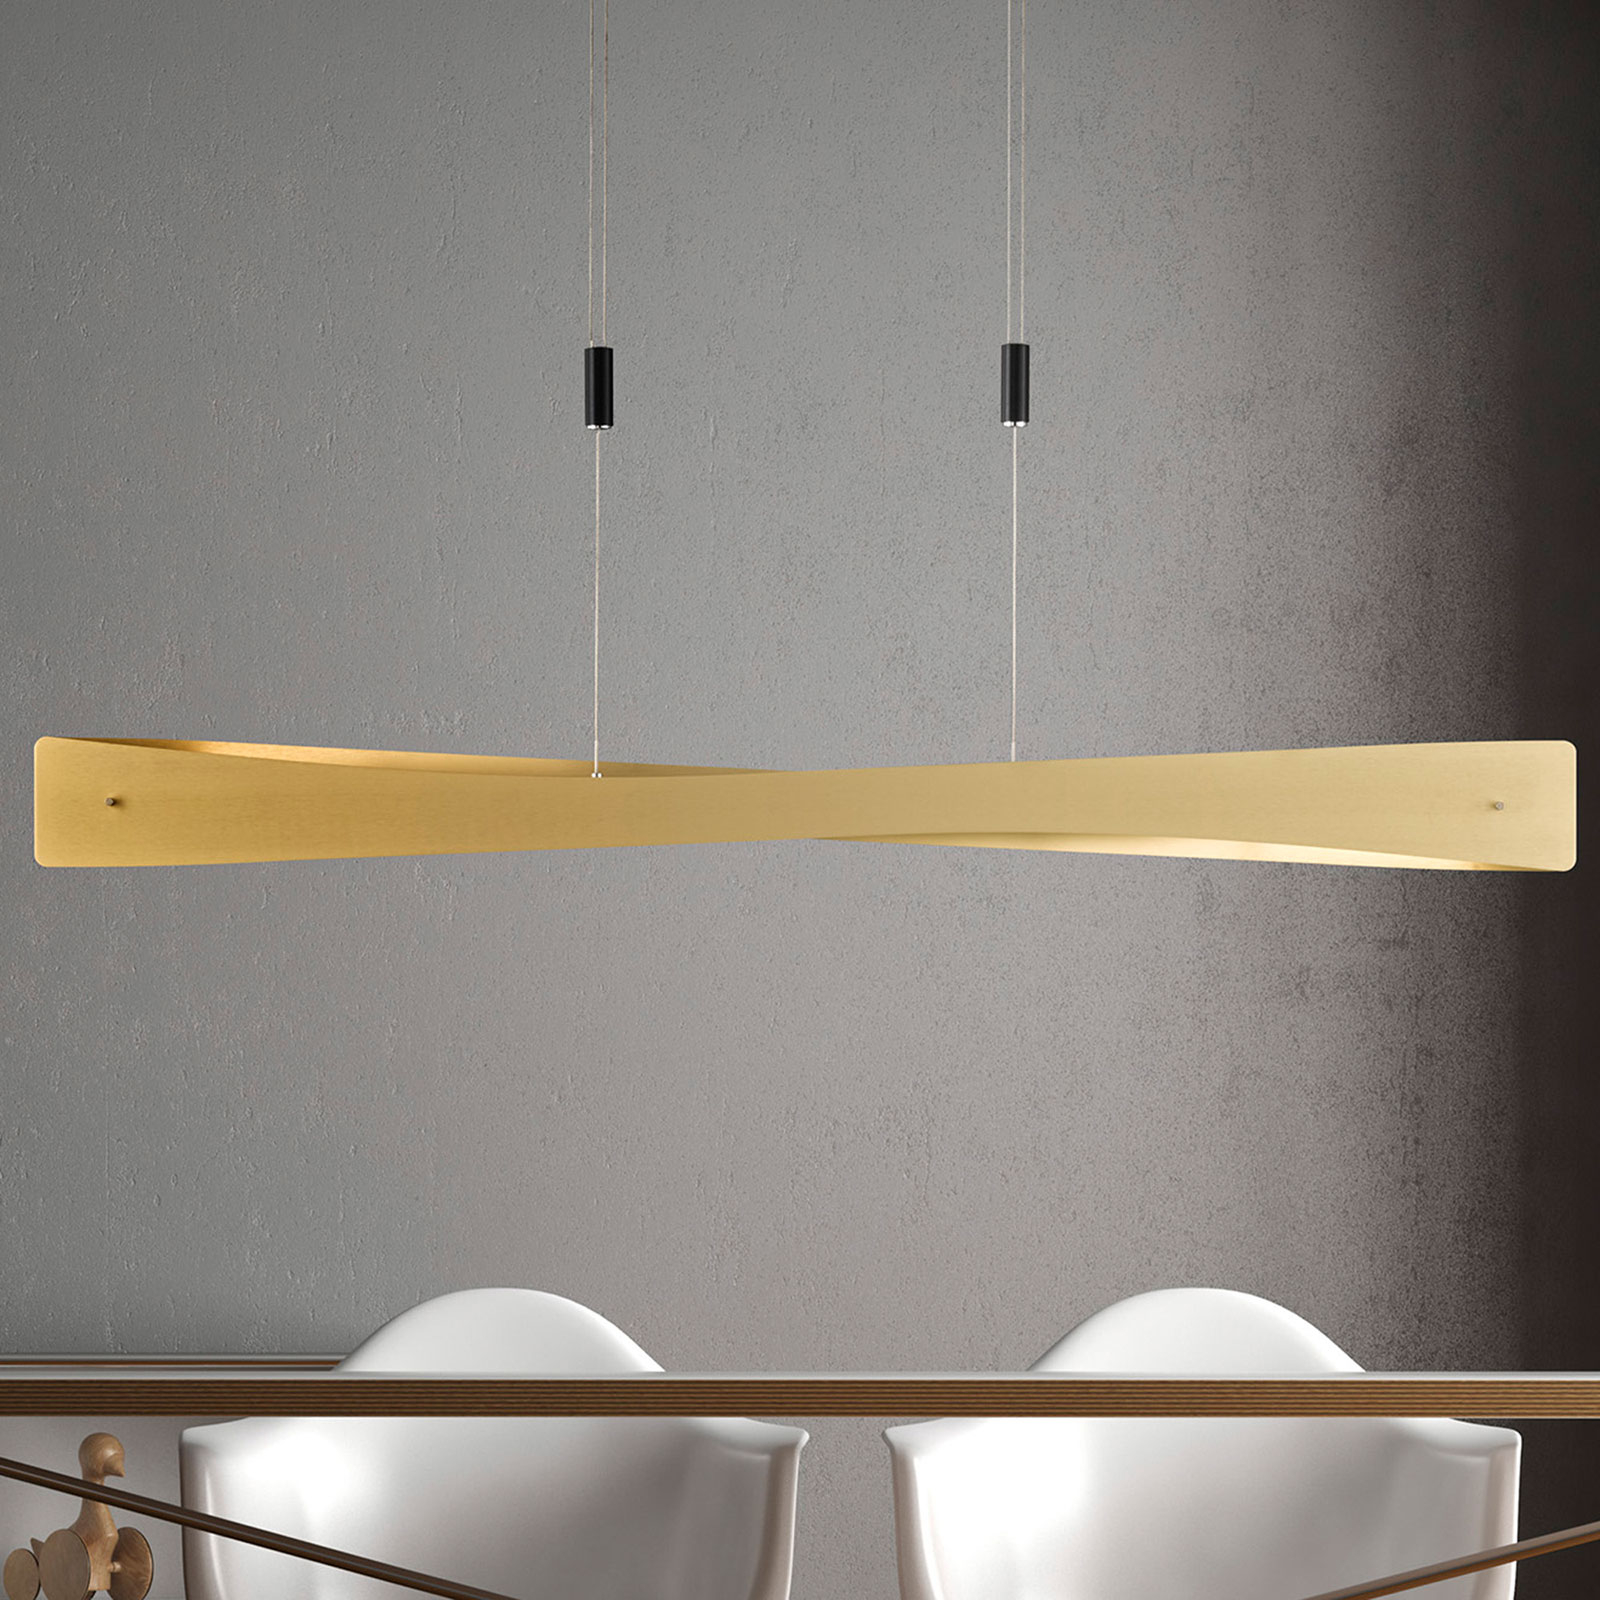 Lucande Lian LED hanglamp, messing, zwart